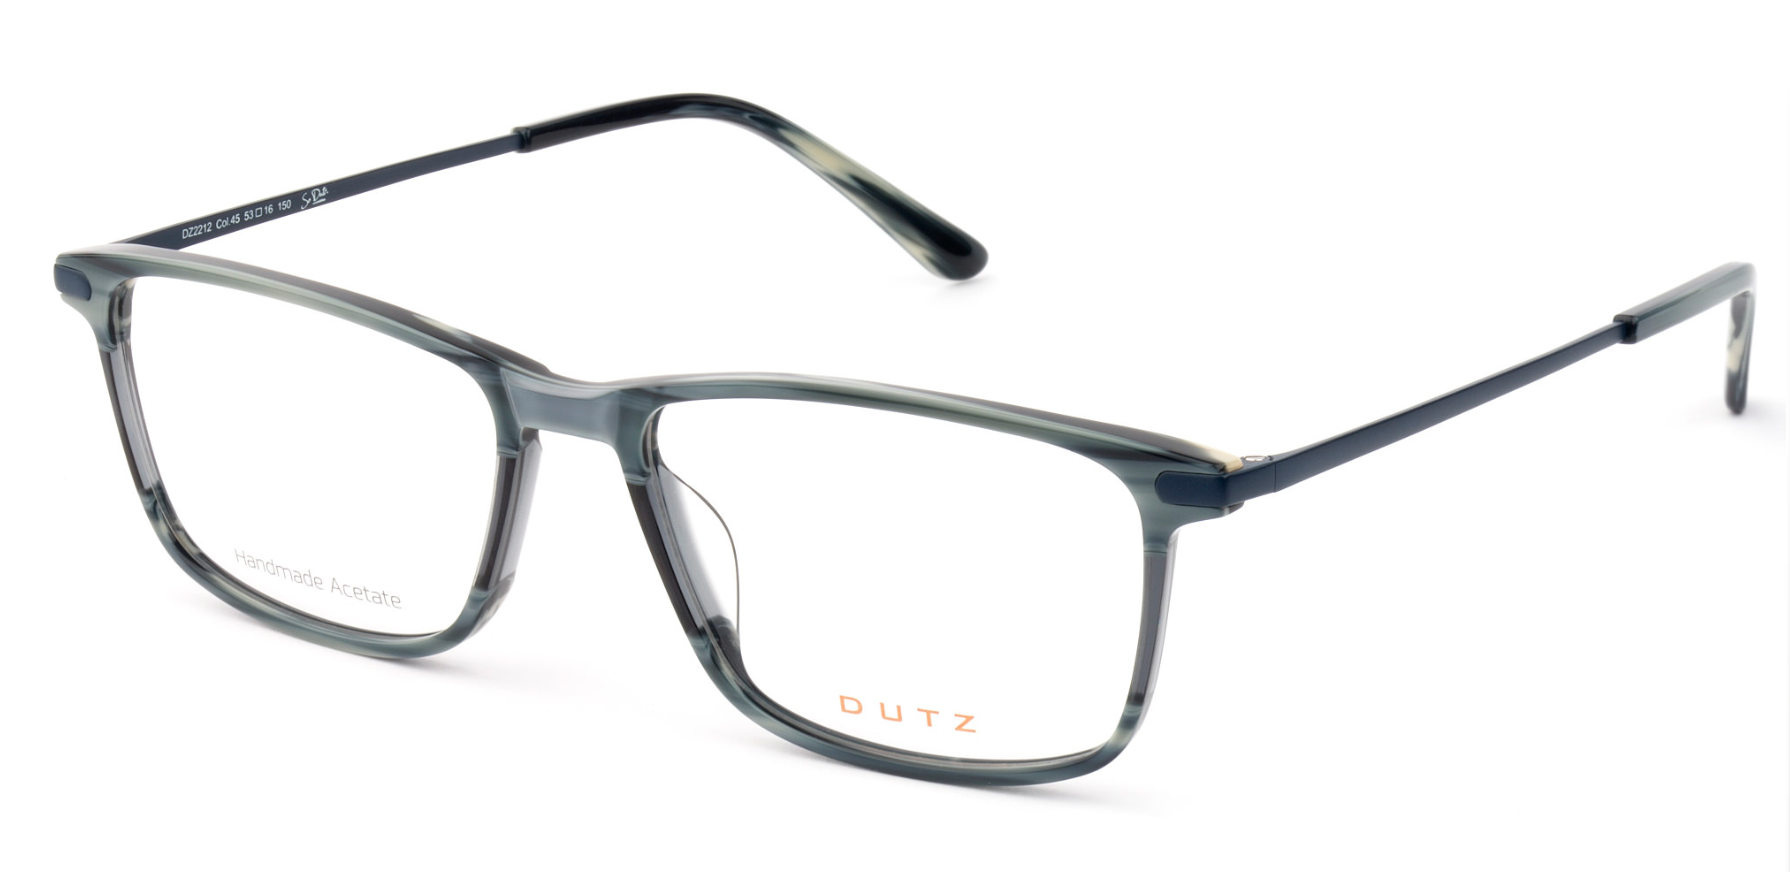 b50542ff44 Dutz Eyewear at Optical Innovations KC 3